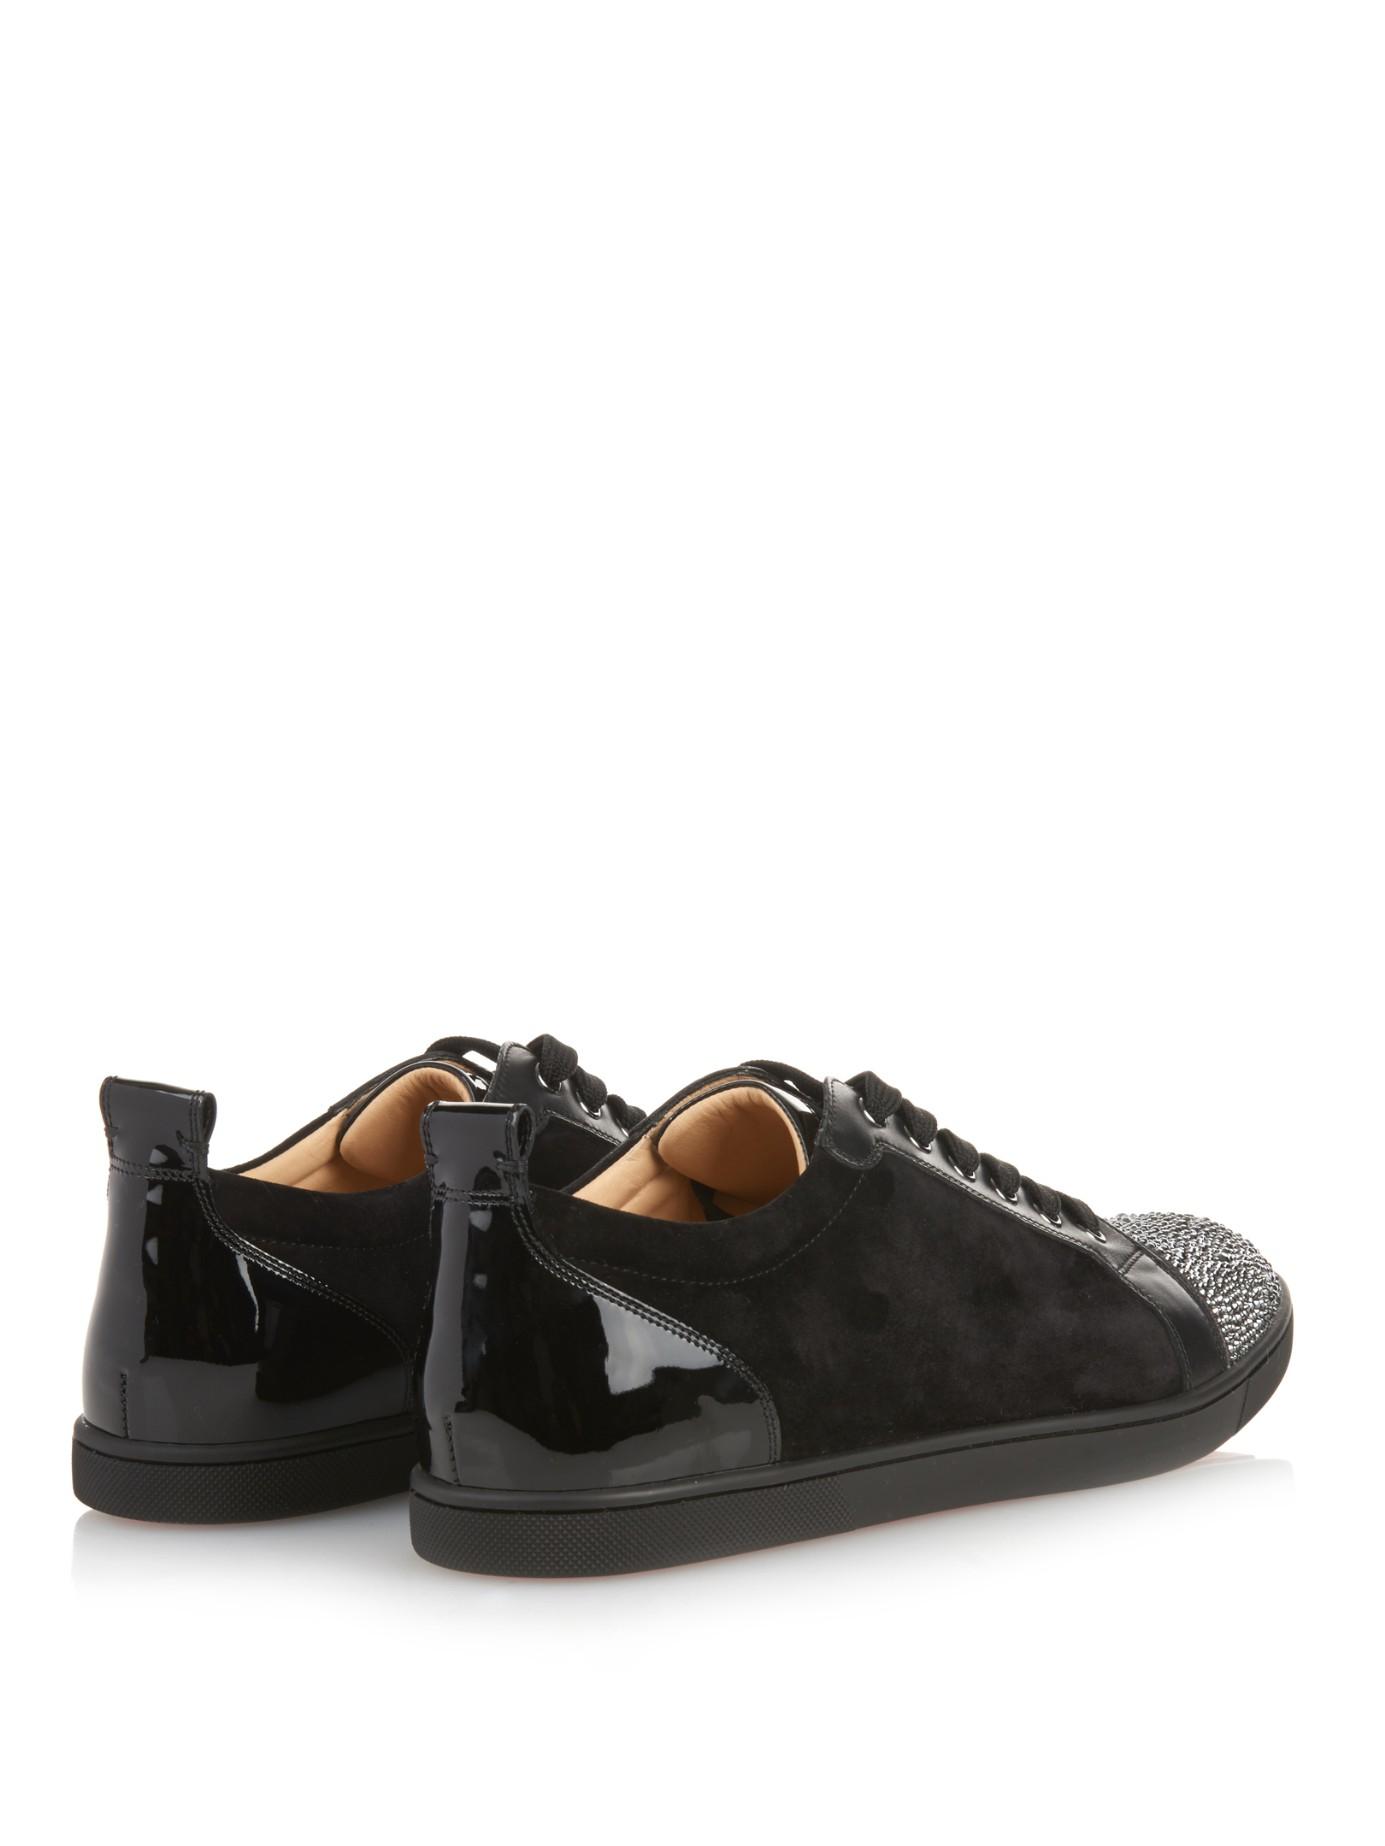 599d55e6f0e Artesur   christian louboutin suede sneakers Black Strass crystal